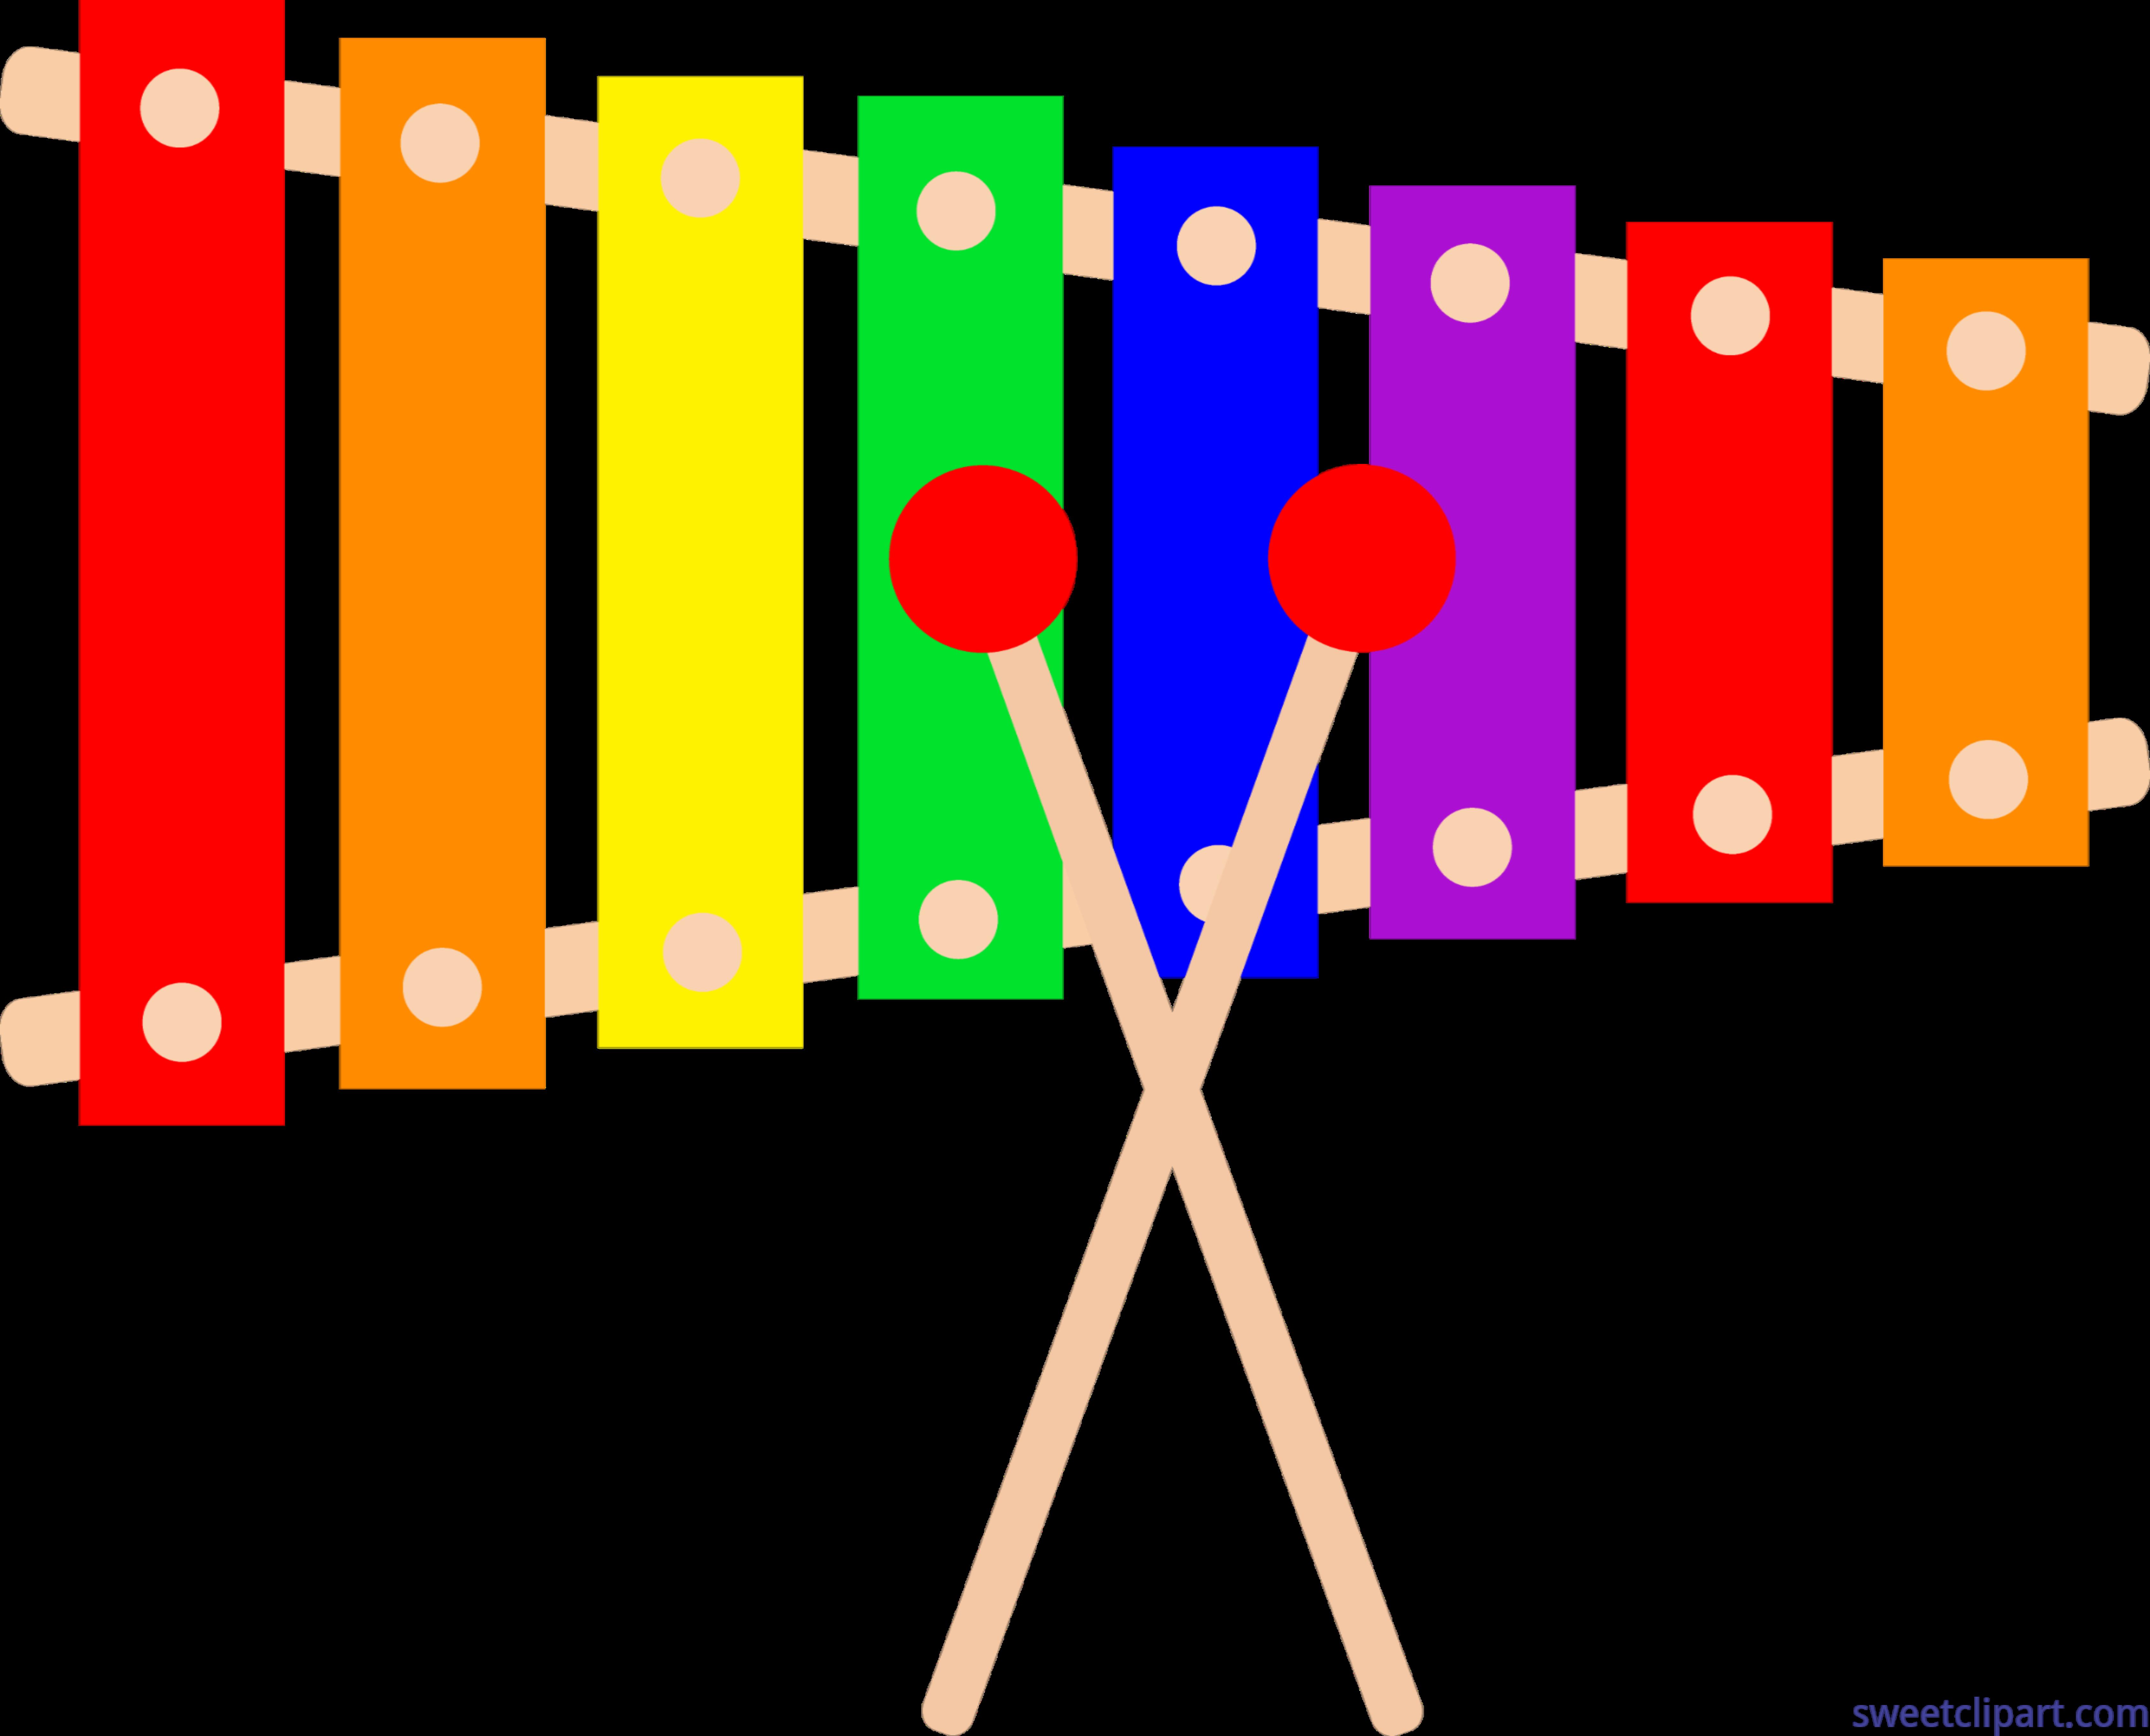 xylophone clip art sweet clip art rh m sweetclipart com Xylophone Clip Art Black and White xylophone clipart free